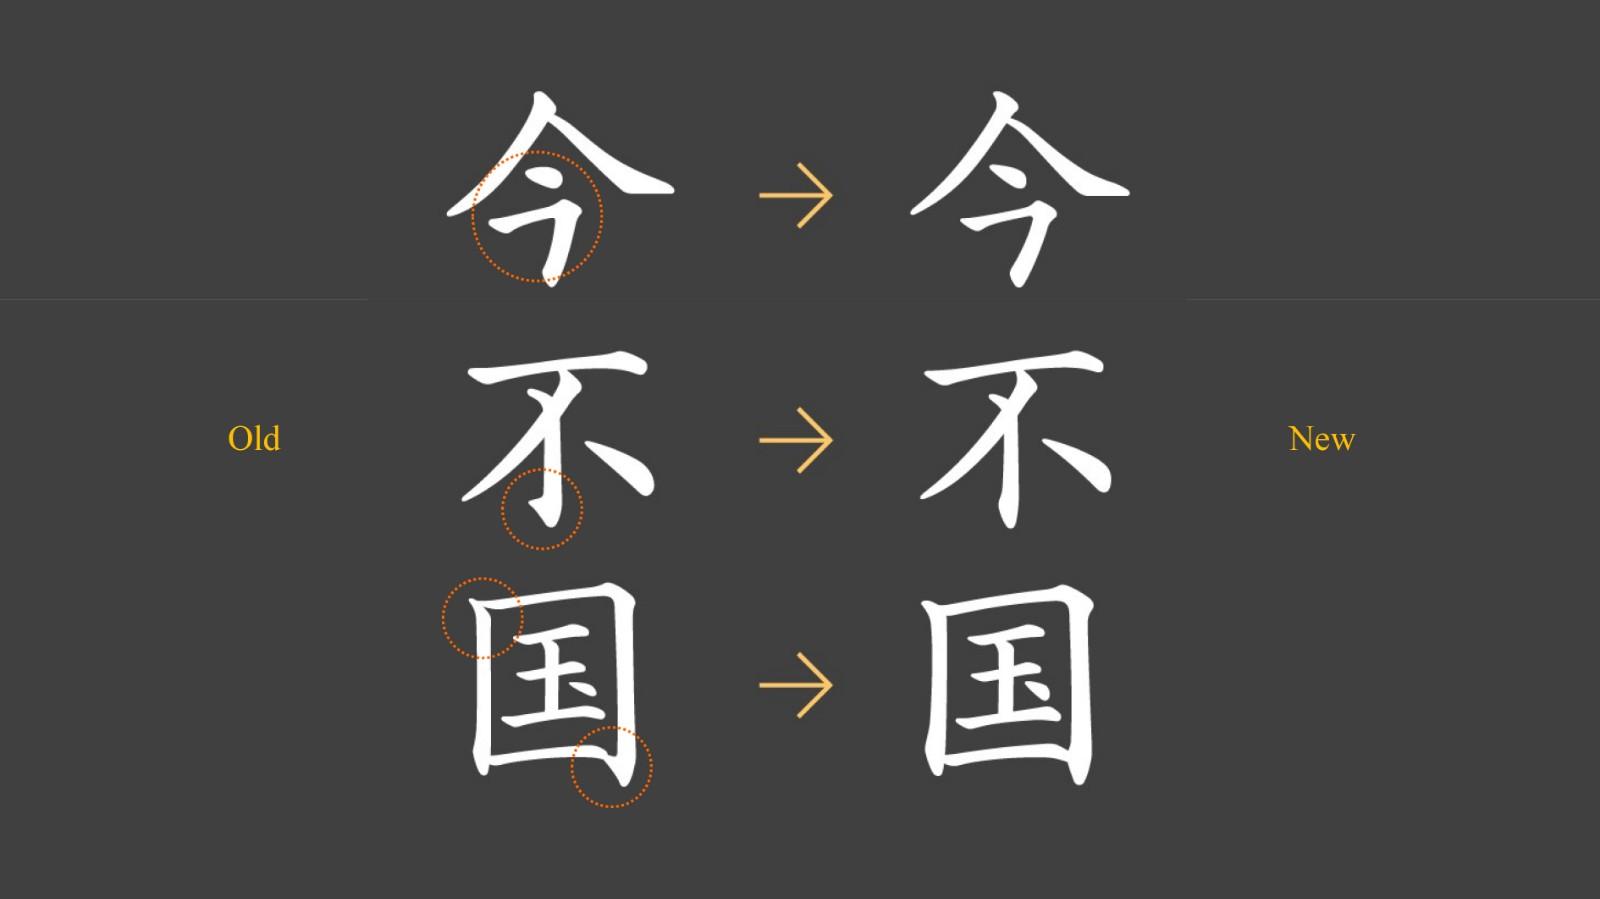 https://ft-bk1.oss-cn-zhangjiakou.aliyuncs.com/Public/Uploads/img/n_content_20201210104558_6421.jpg